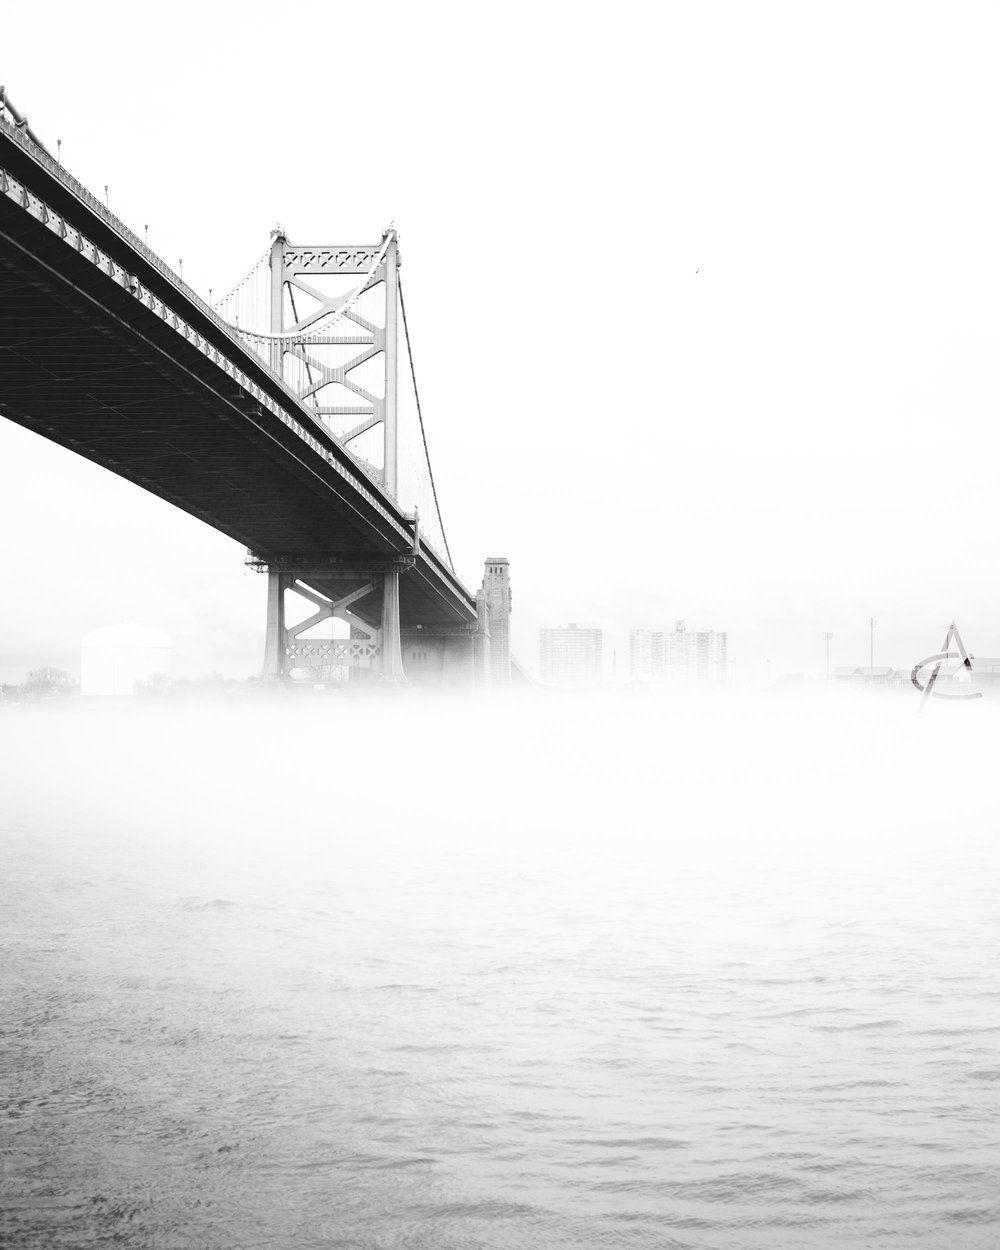 Philly_1_23_18_08.jpg